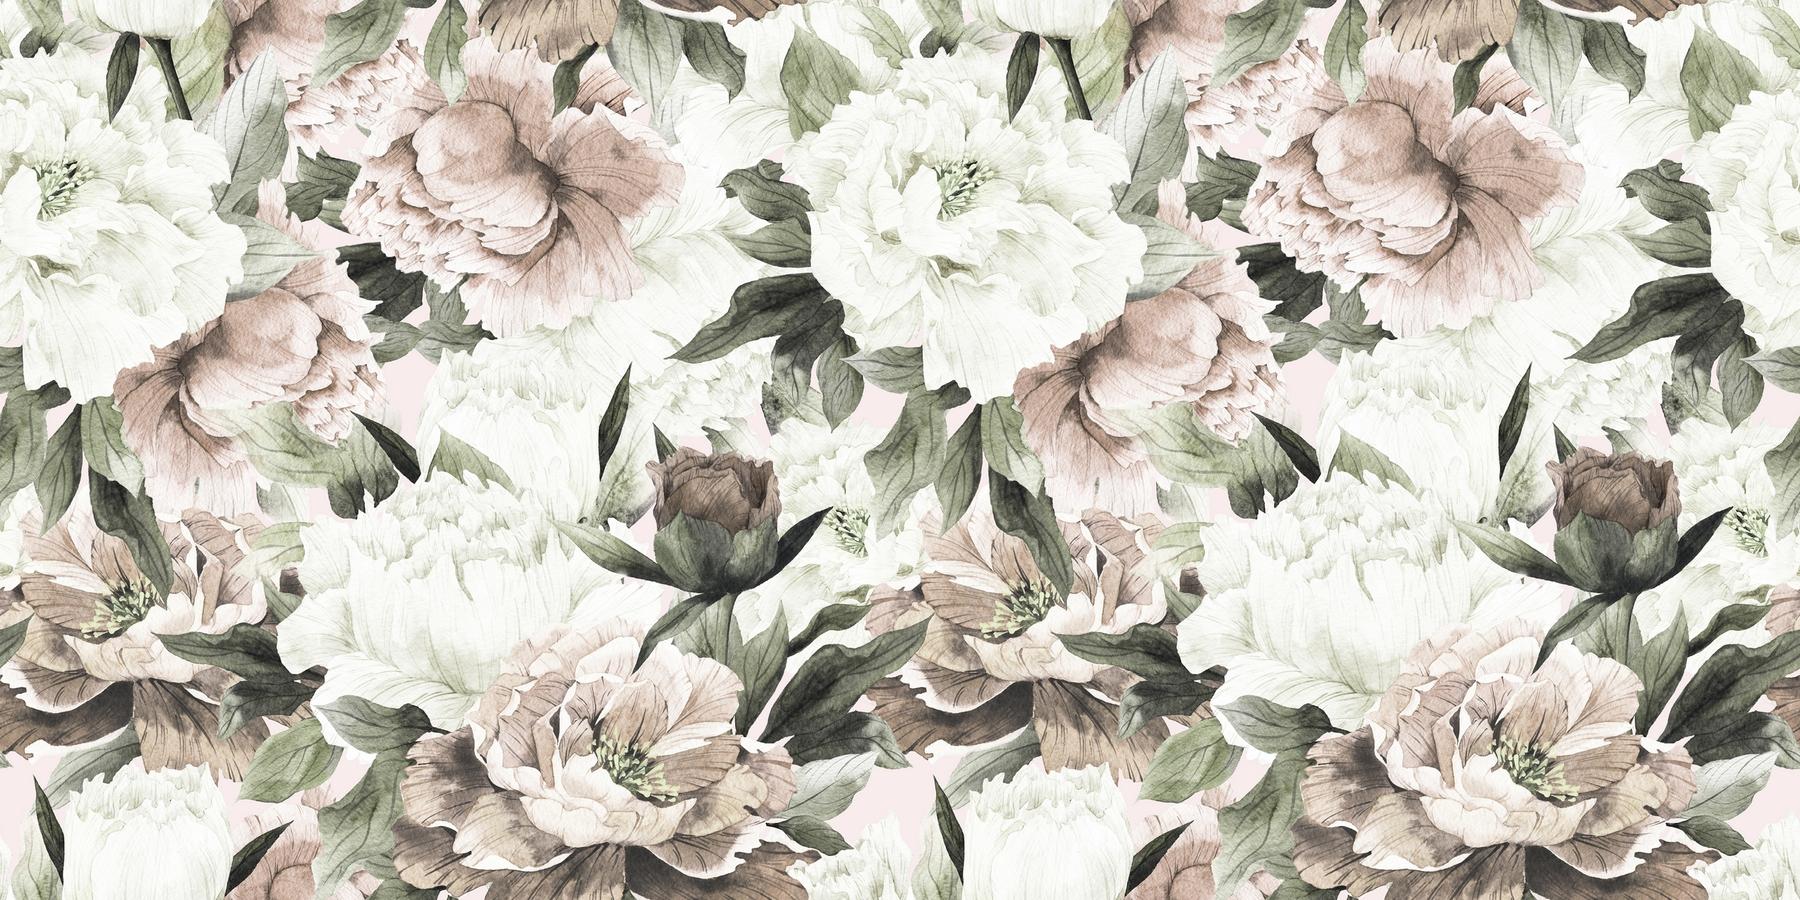 Buy Vintage Blush Floral Wall Mural